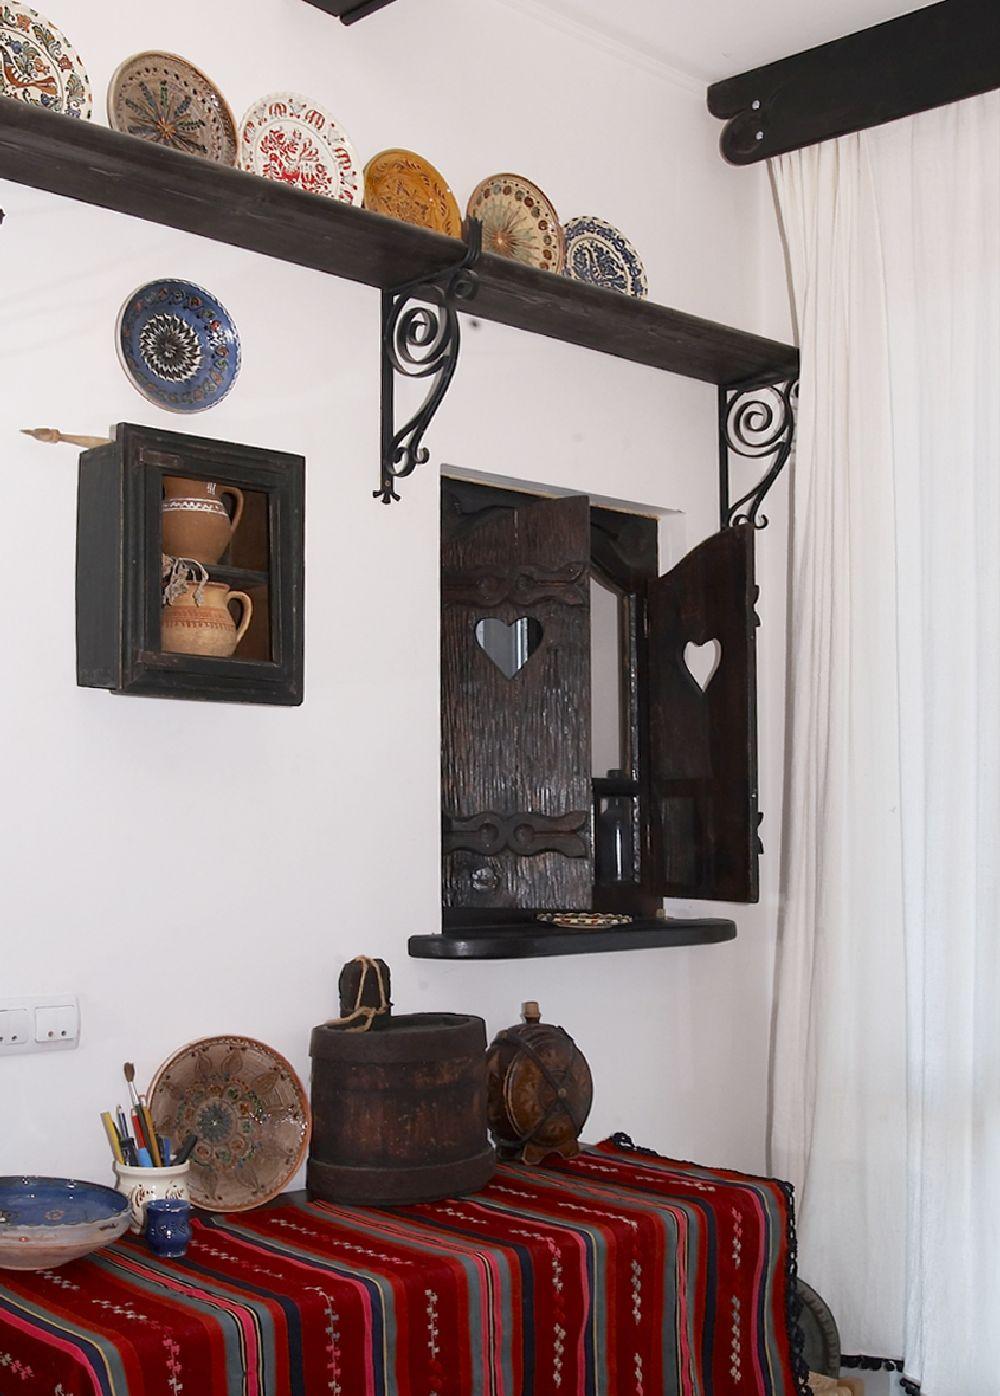 adelaparvu.com despre Anca Ciuciulin si casa ei cu decor traditional romanesc (8)